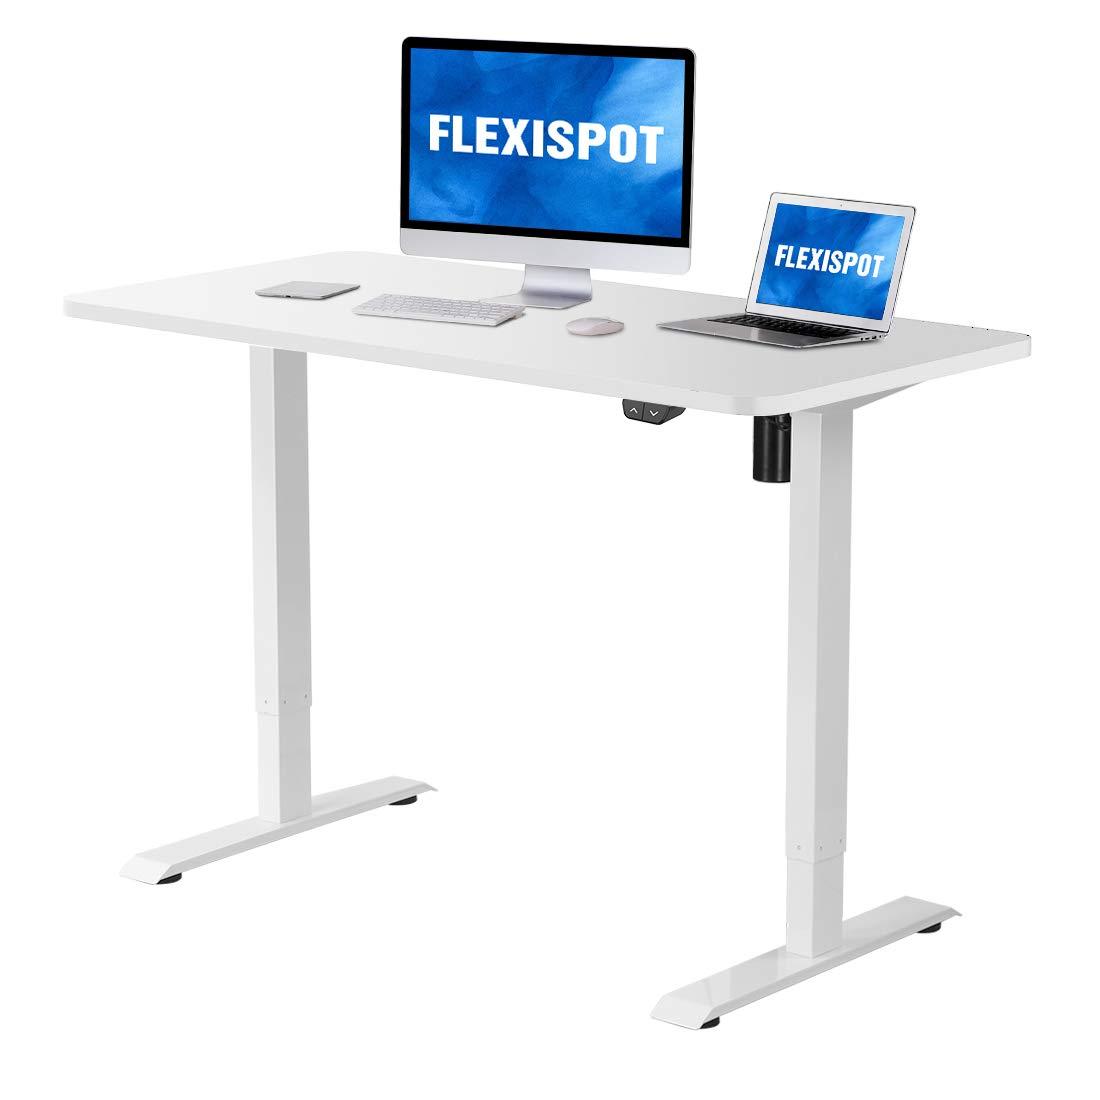 Flexispot EC1W R4830W Electric Adjustable Standing